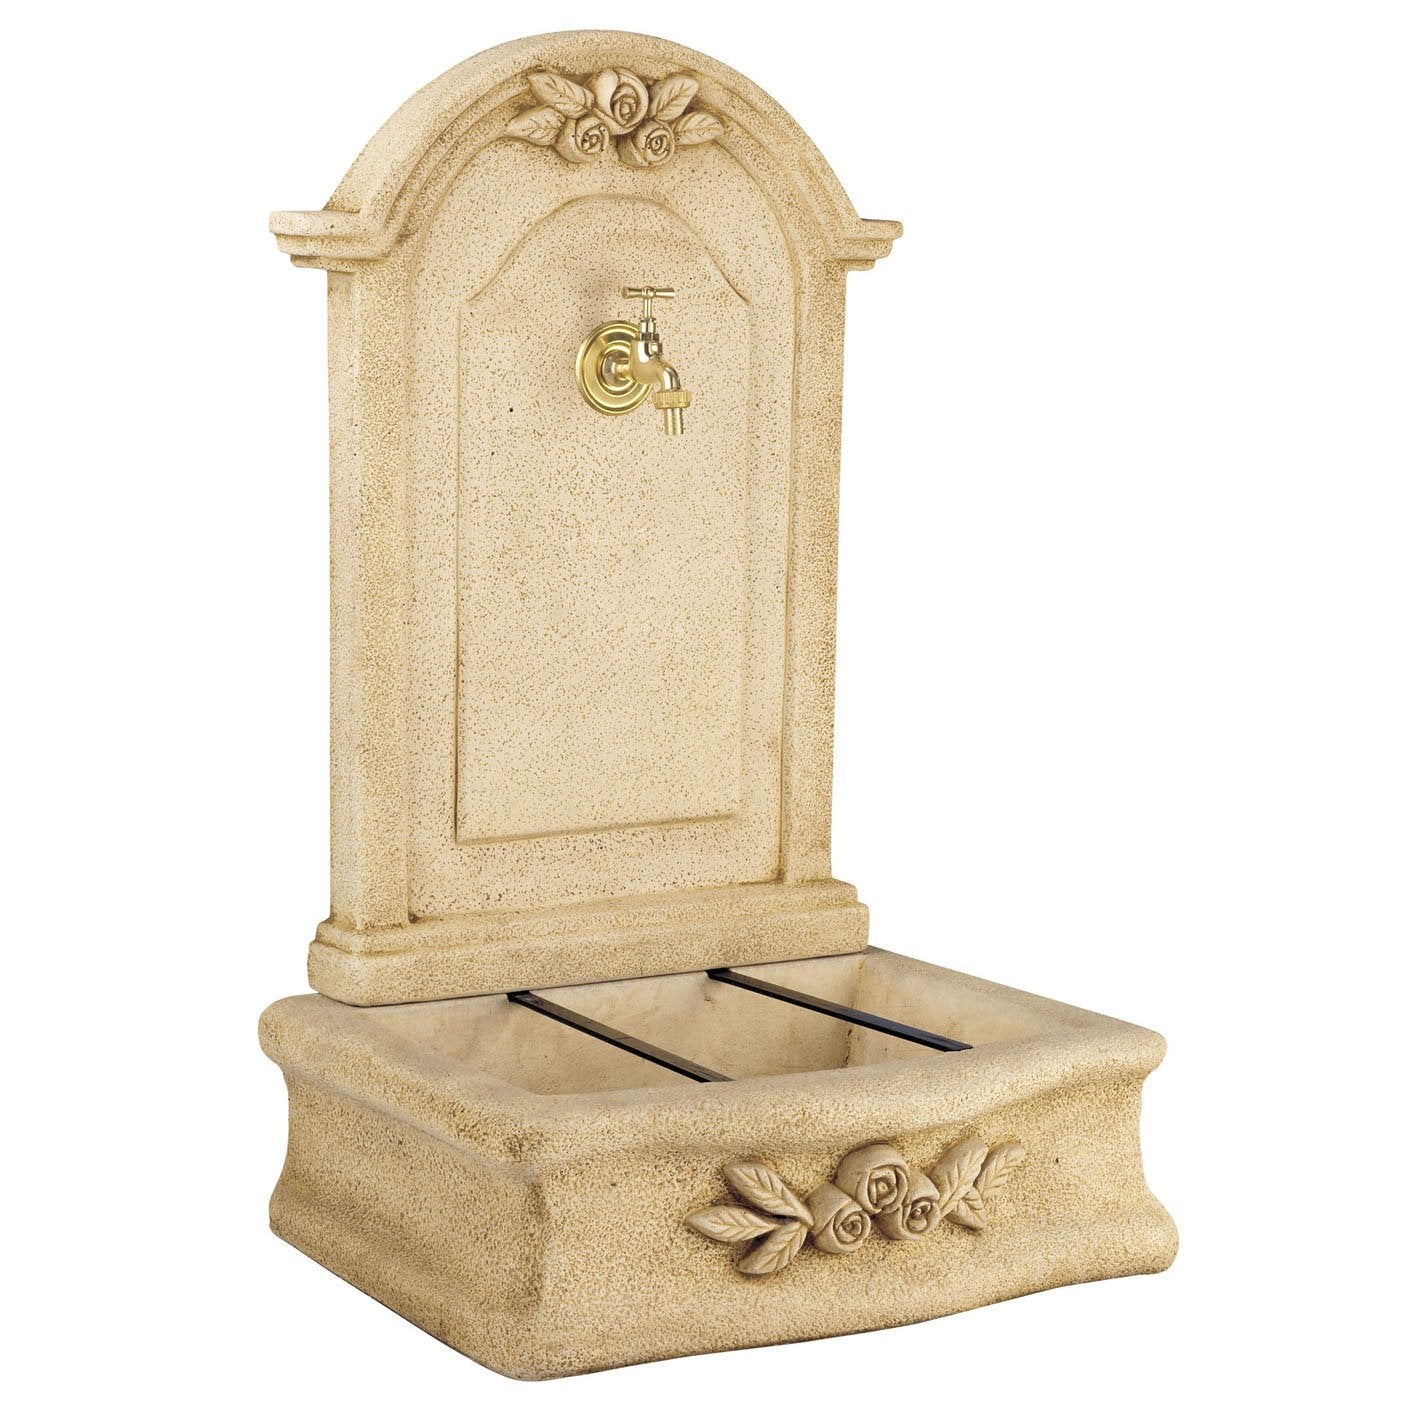 Fontaine De Jardin En Pierre Reconstituee Ton Pierre Beausoleil